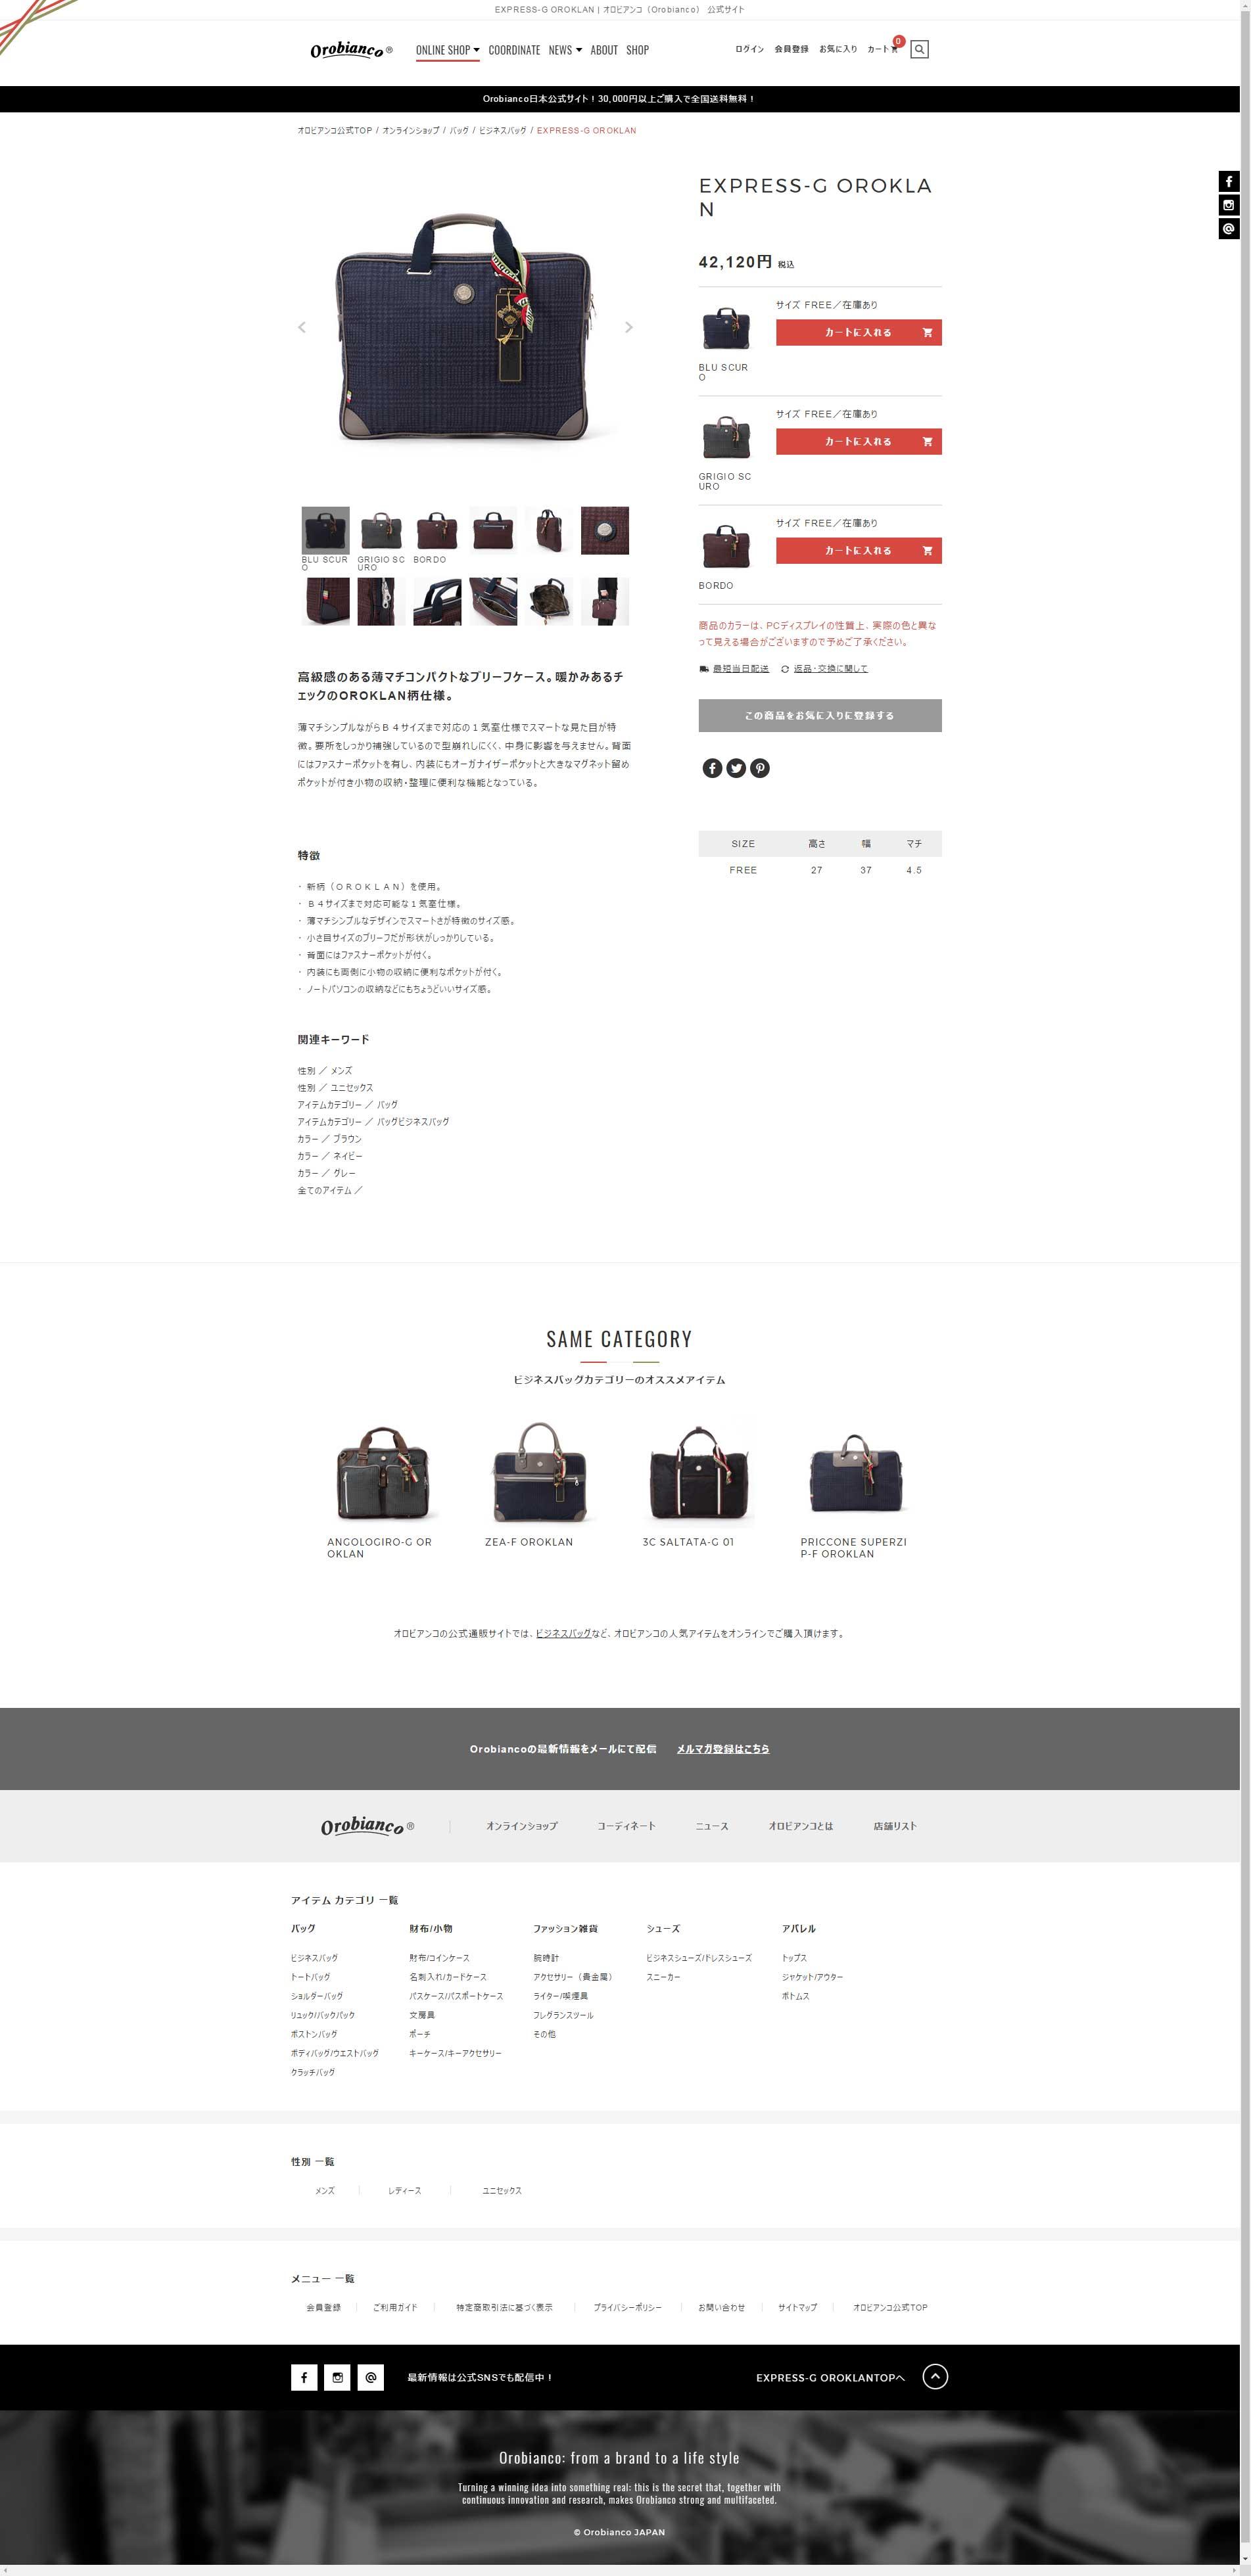 4e2564b611da ブリーフケース バッグ ビジネス 鞄 旅行かばん 出張 B4サイズ対応 ...